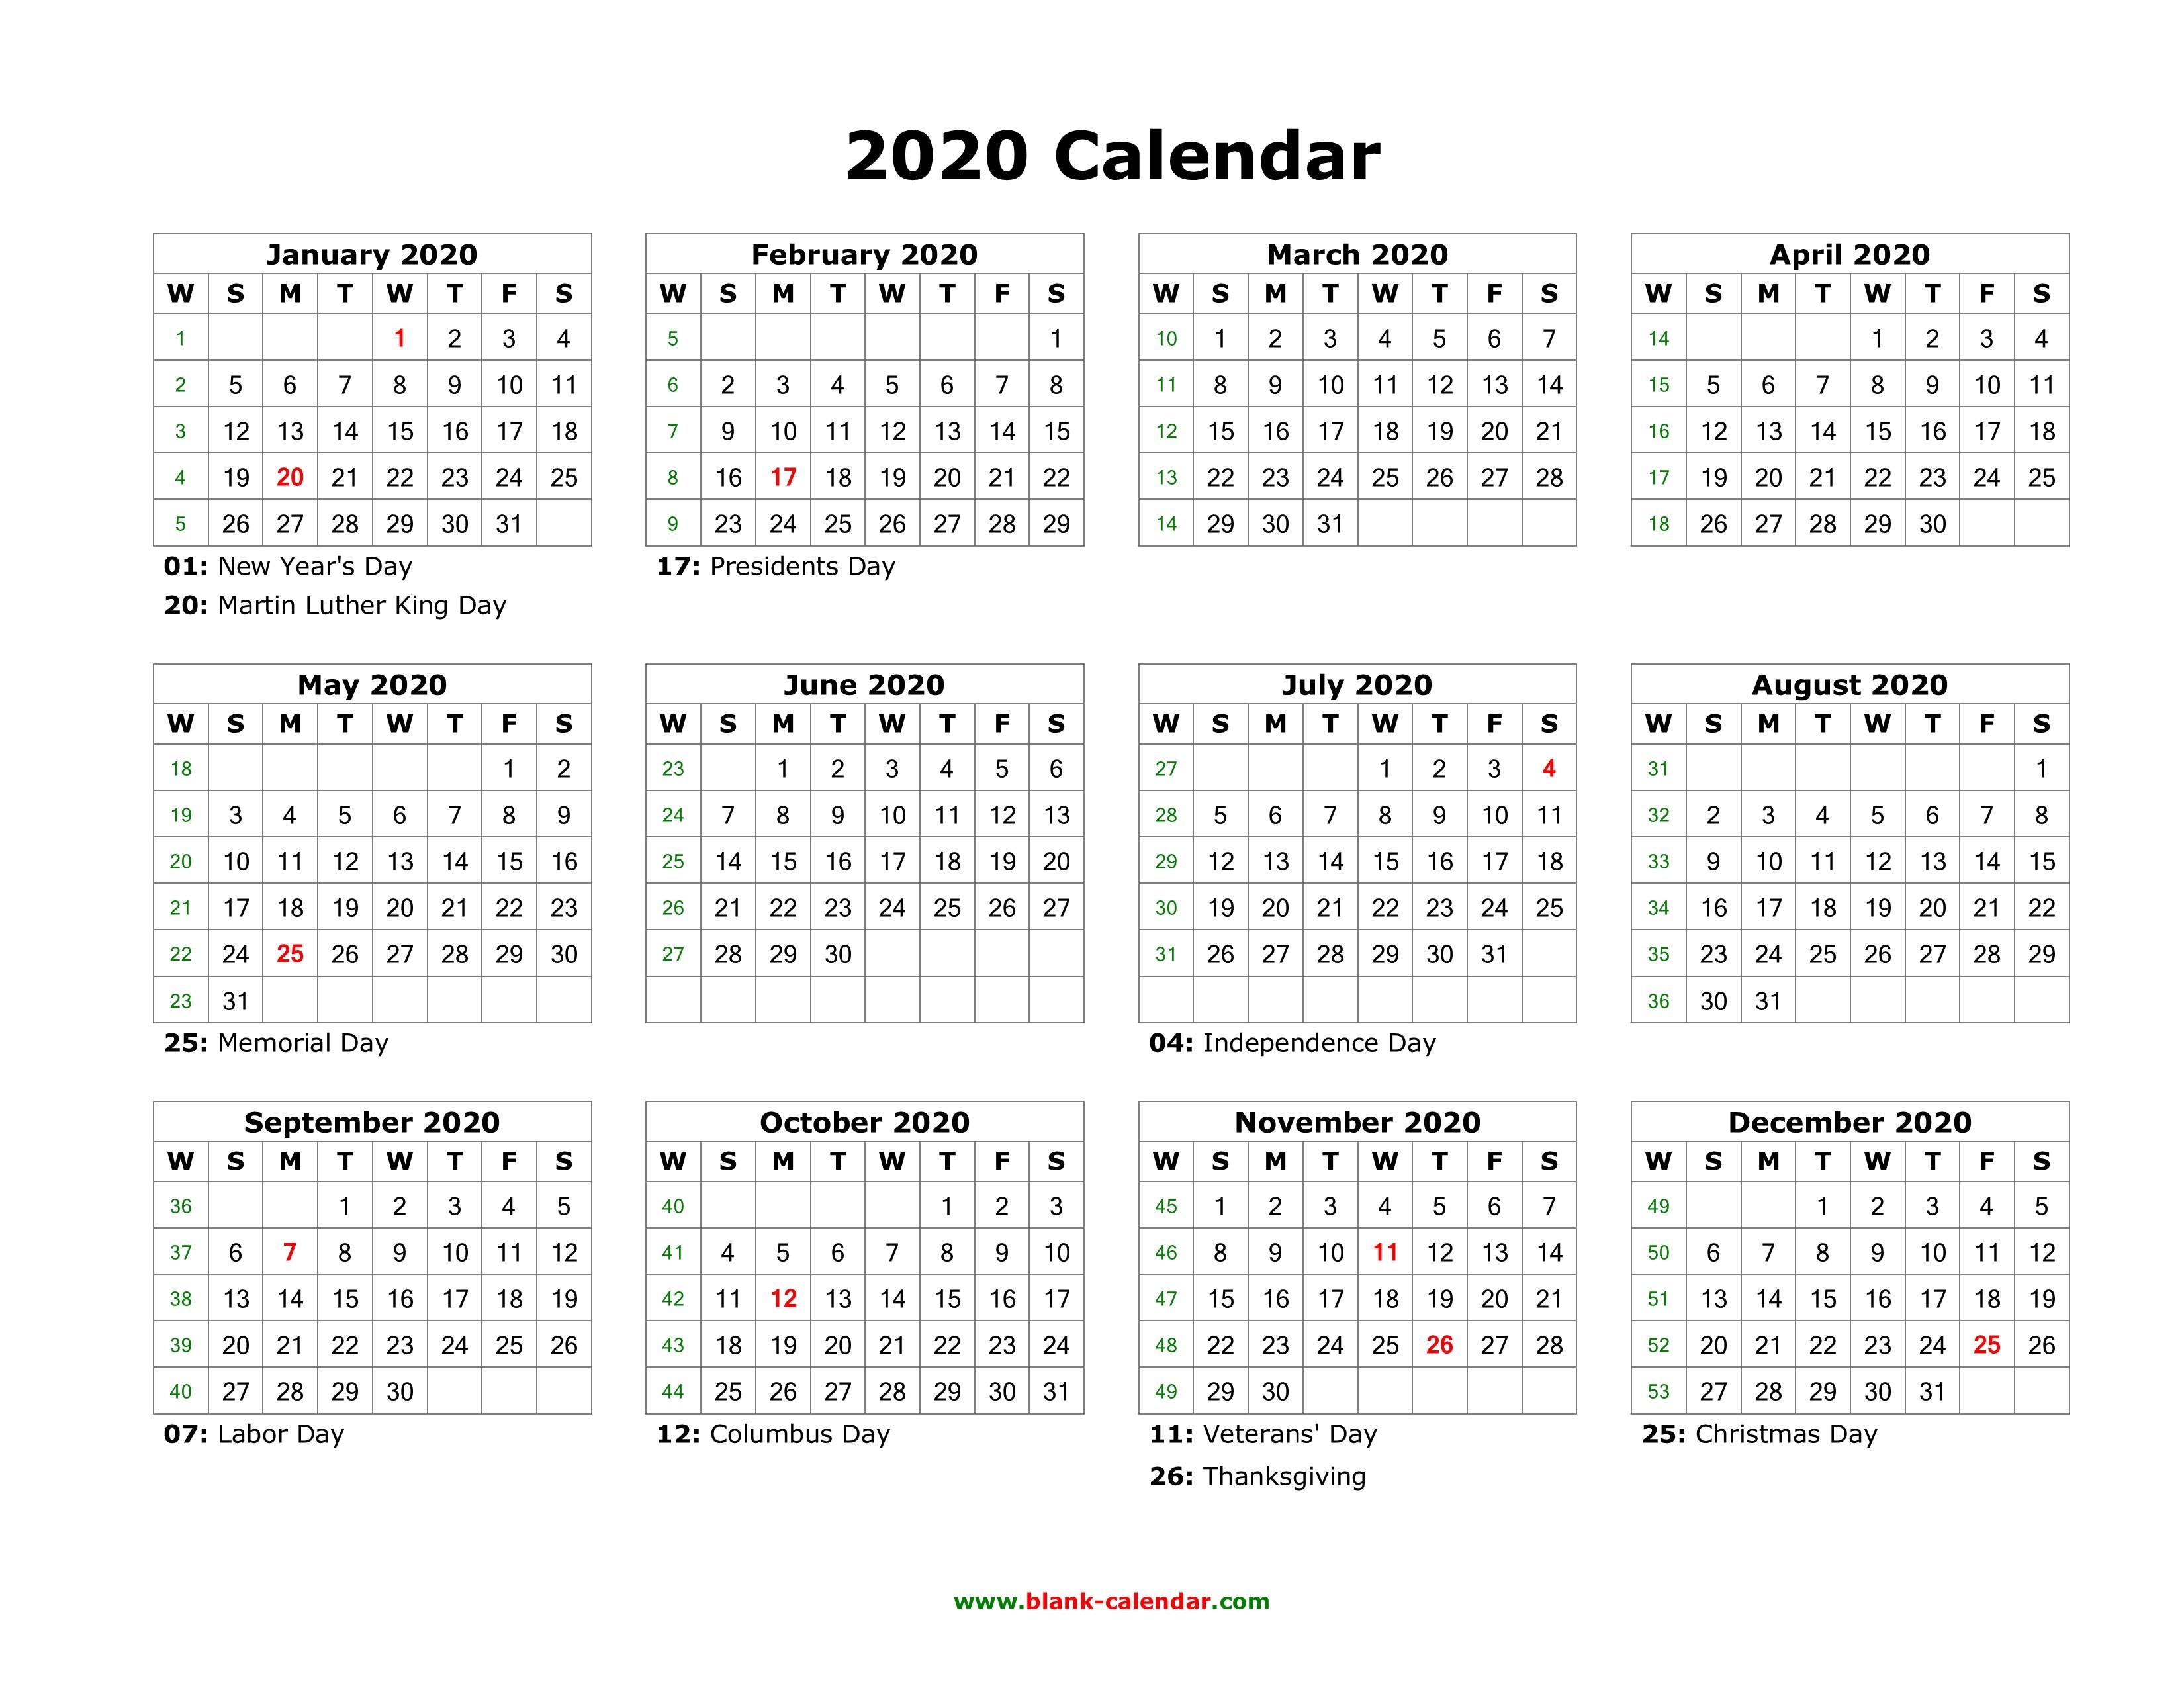 Pdf Printable Calendar 2020 Download Blank Calendar 2020 with Us Holidays 12 Months